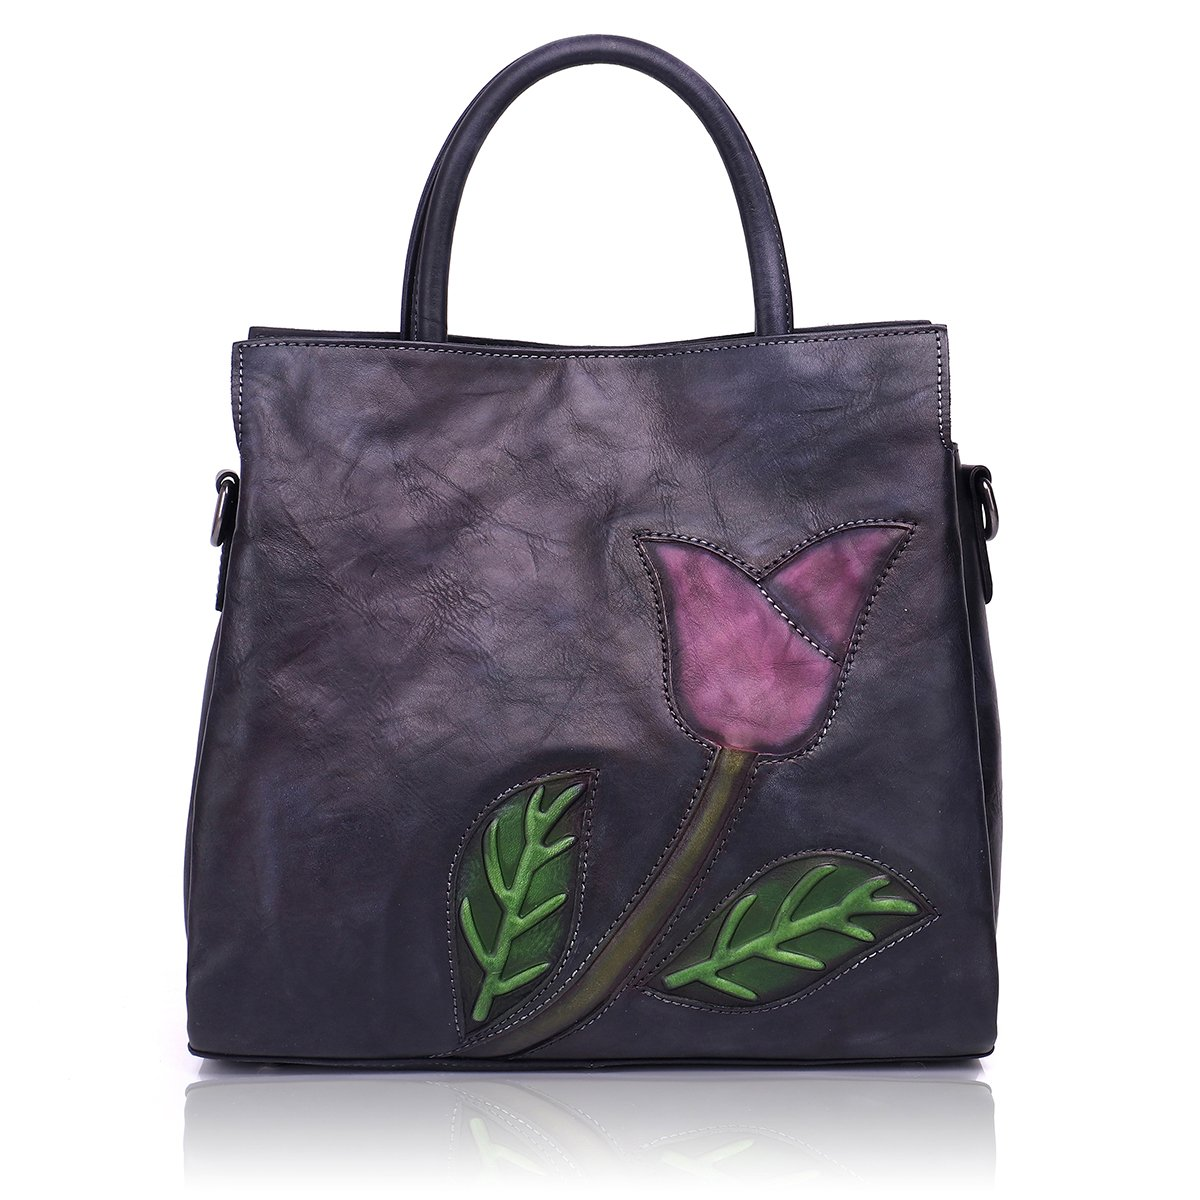 Aphison Designer Soft Leather Totes Handbags for Women, Ladies Satchels Shoulder Bags (BLACK)